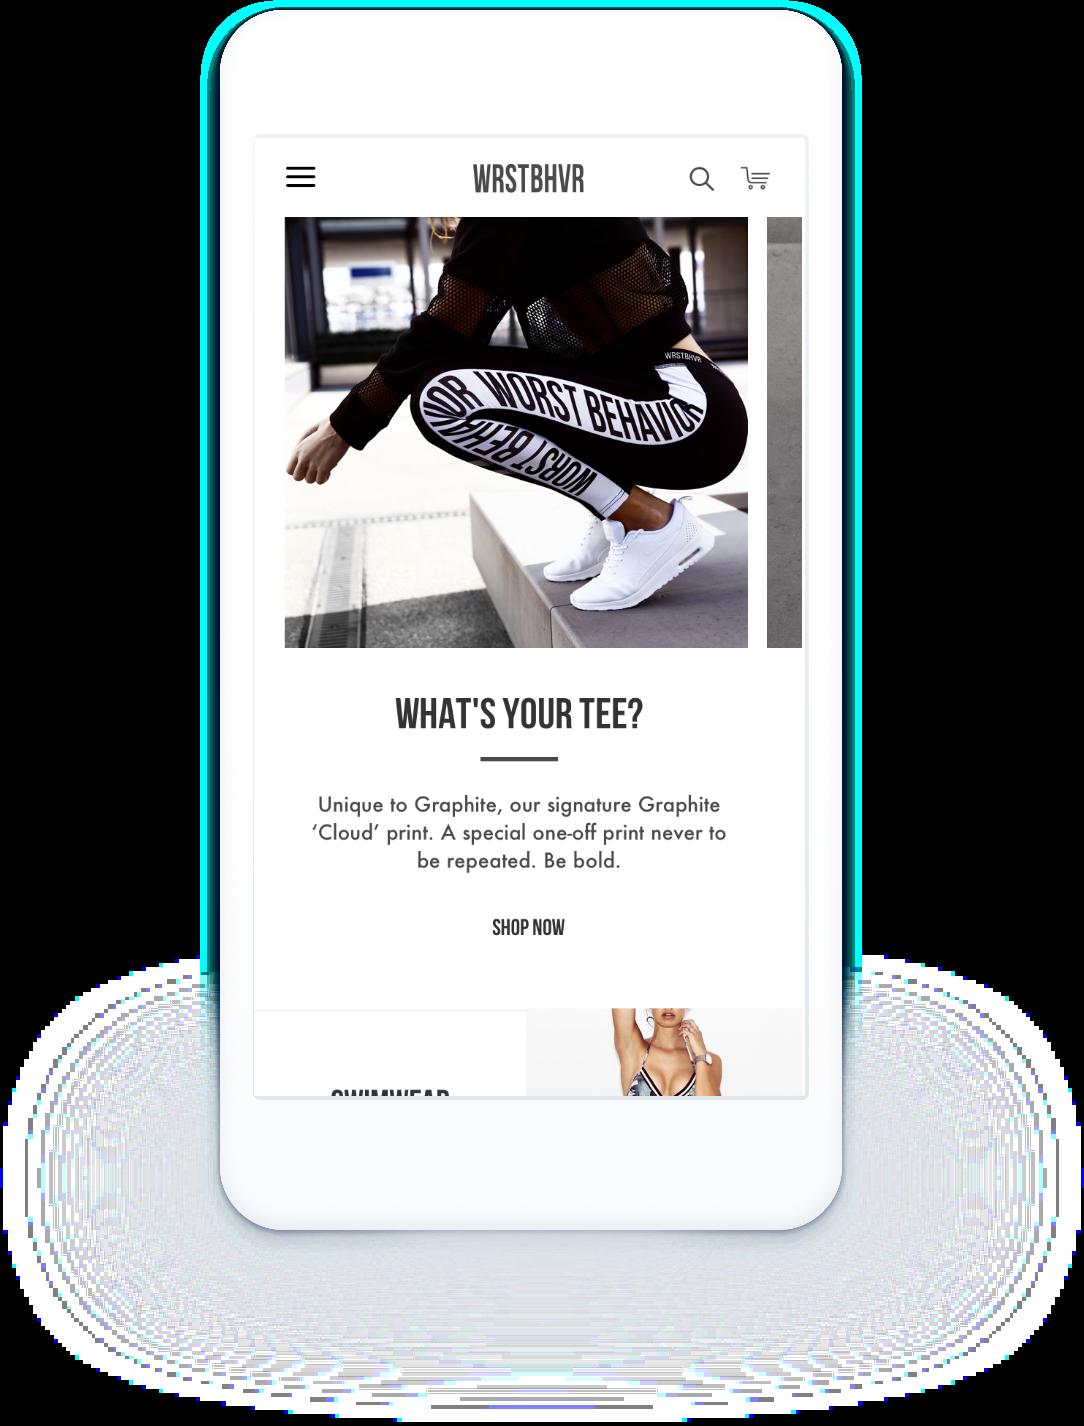 E-Commerce Shopware Shop Wrst Bhvr mobile optimiert und responsive